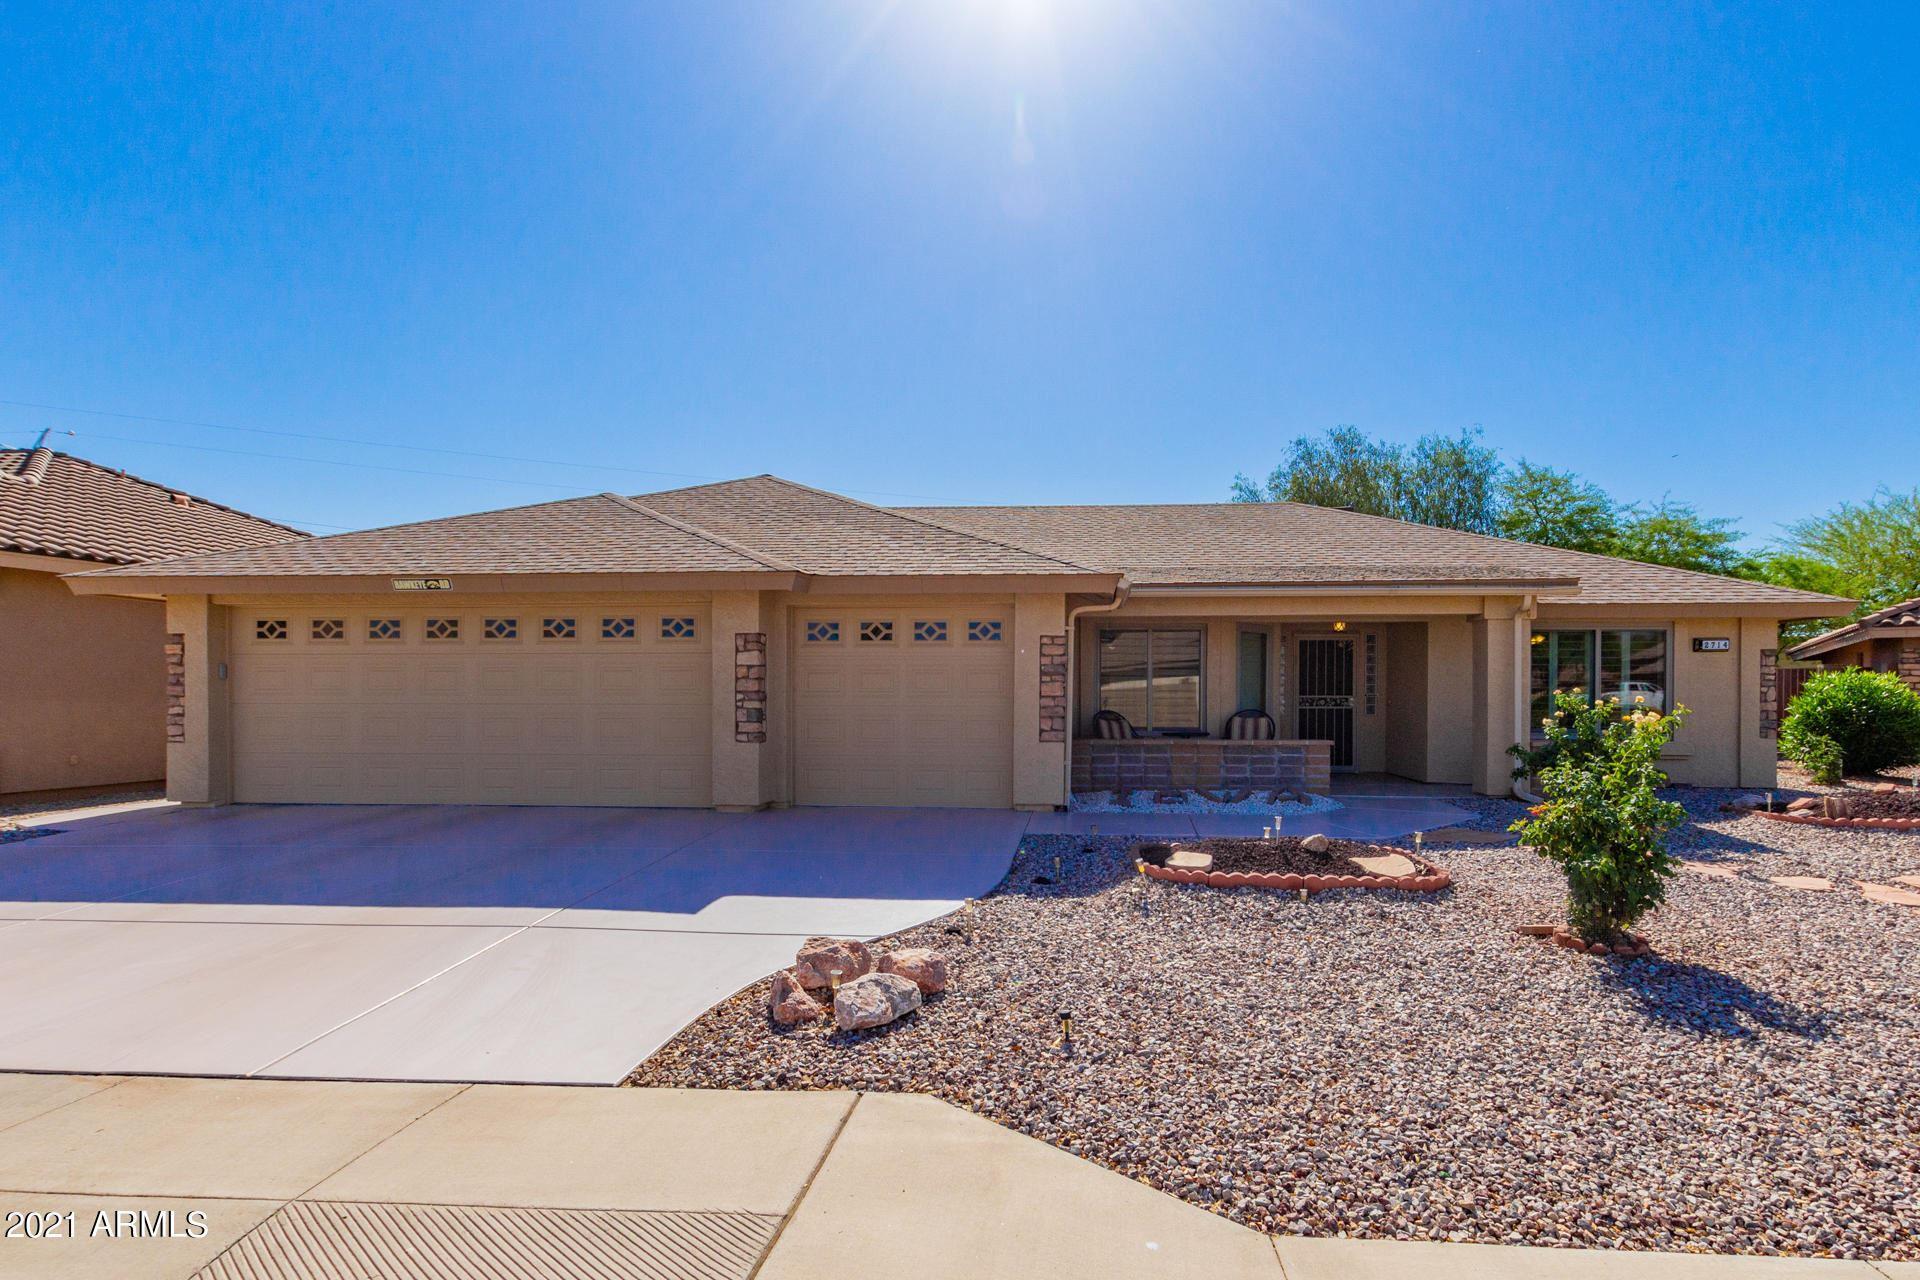 2714 S WILLOW WOOD --, Mesa, AZ 85209 - MLS#: 6233432